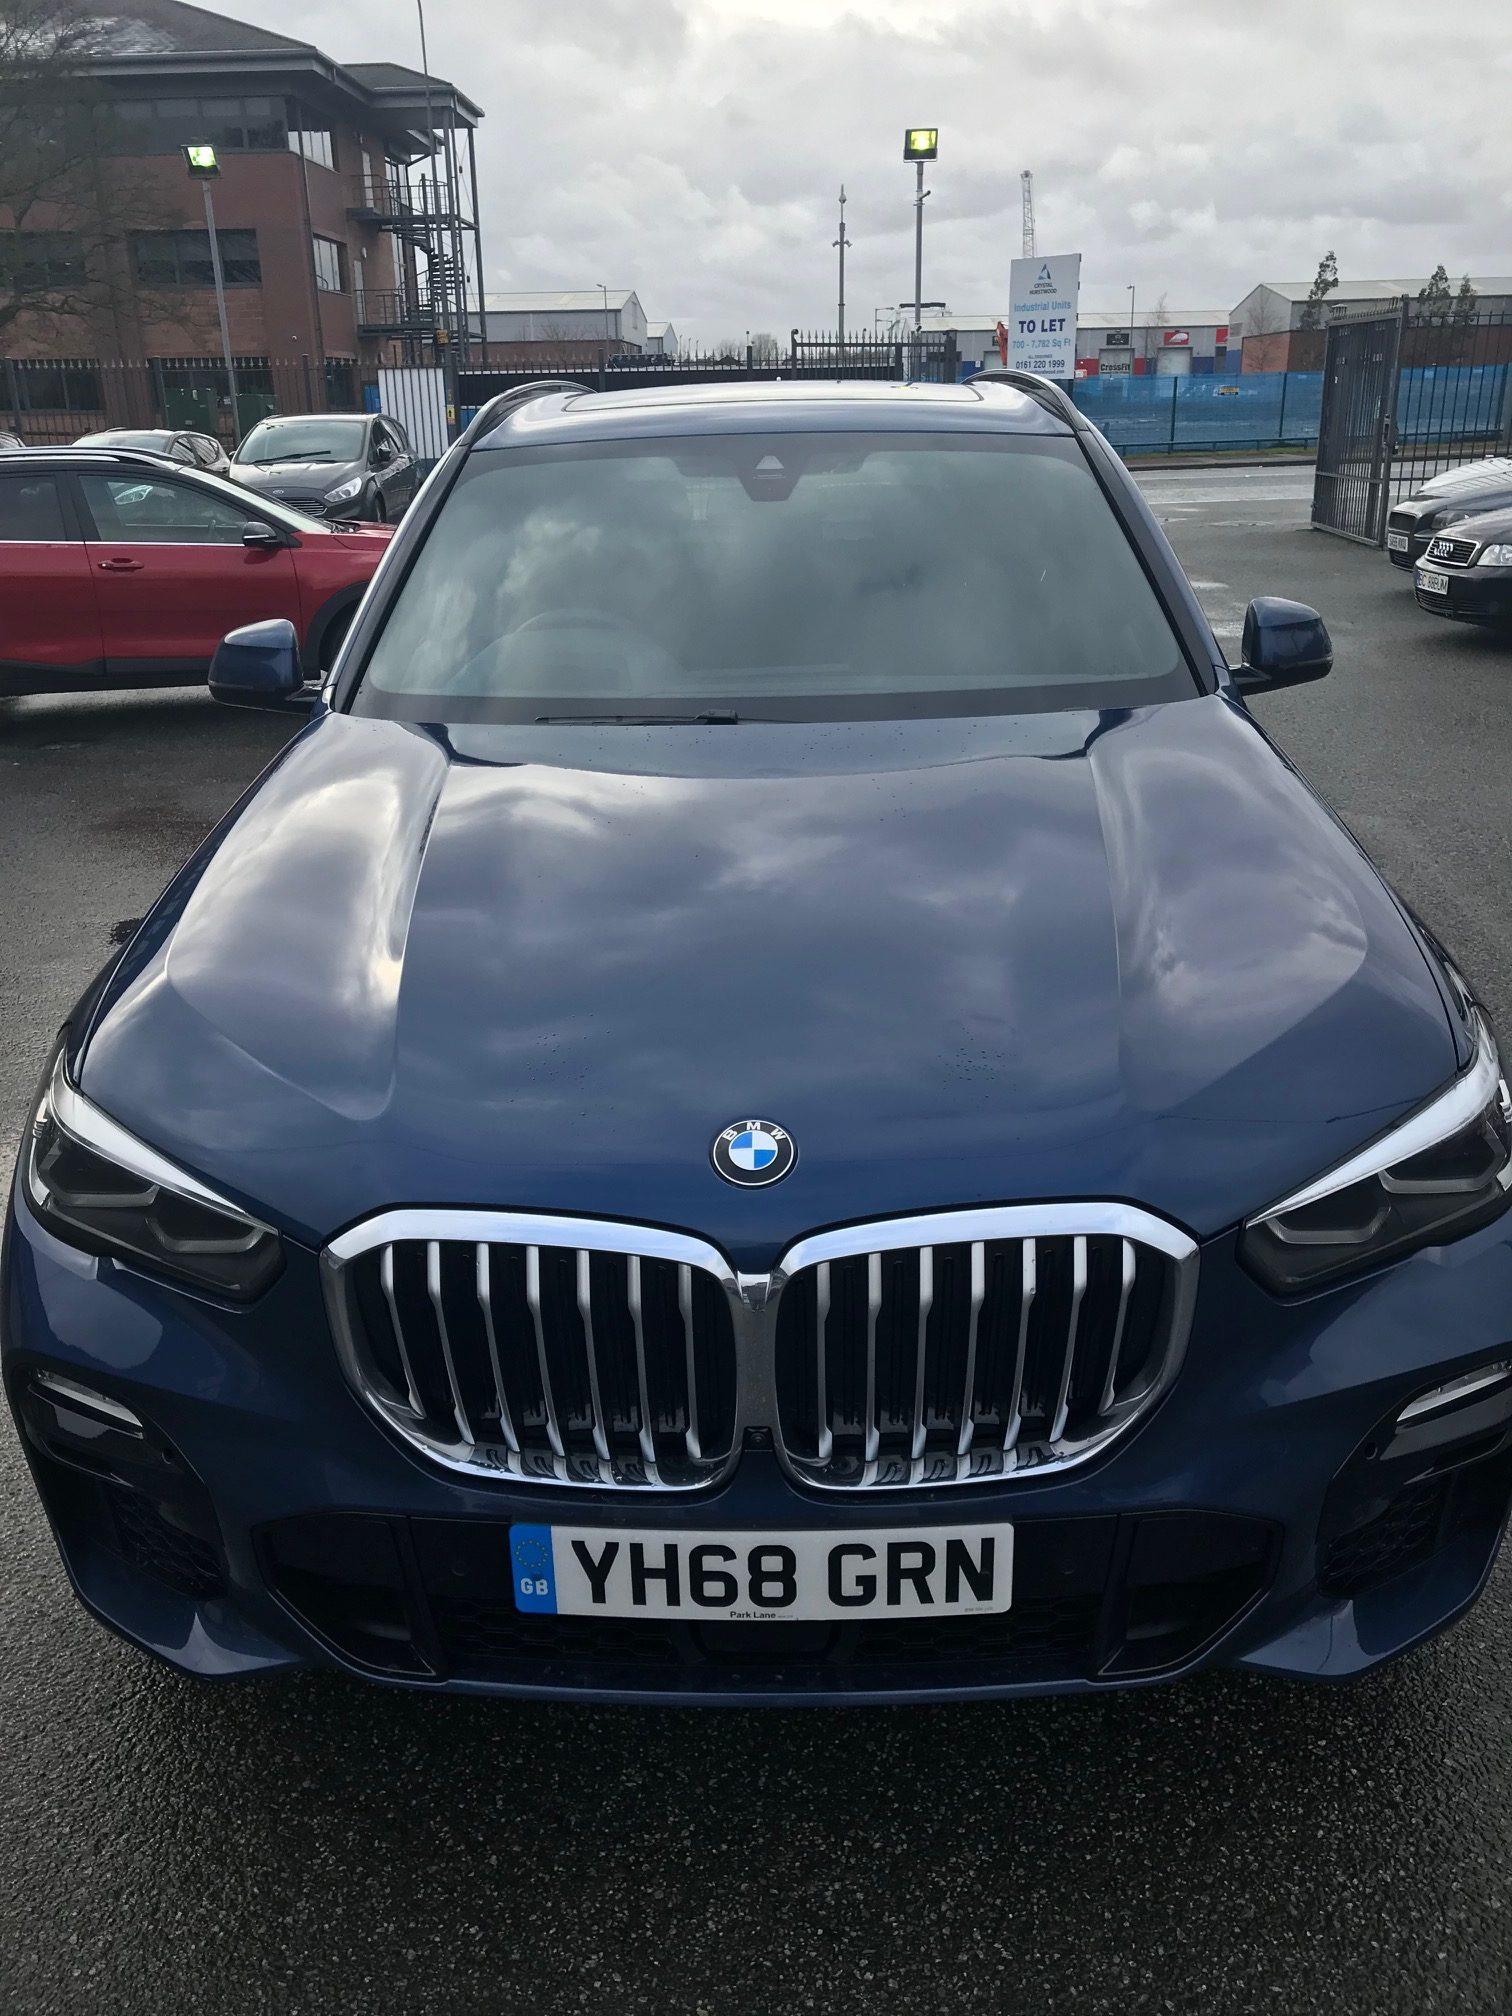 BMW X5 DIESEL ESTATE xDrive30d M Sport 5dr Auto Car Leasing